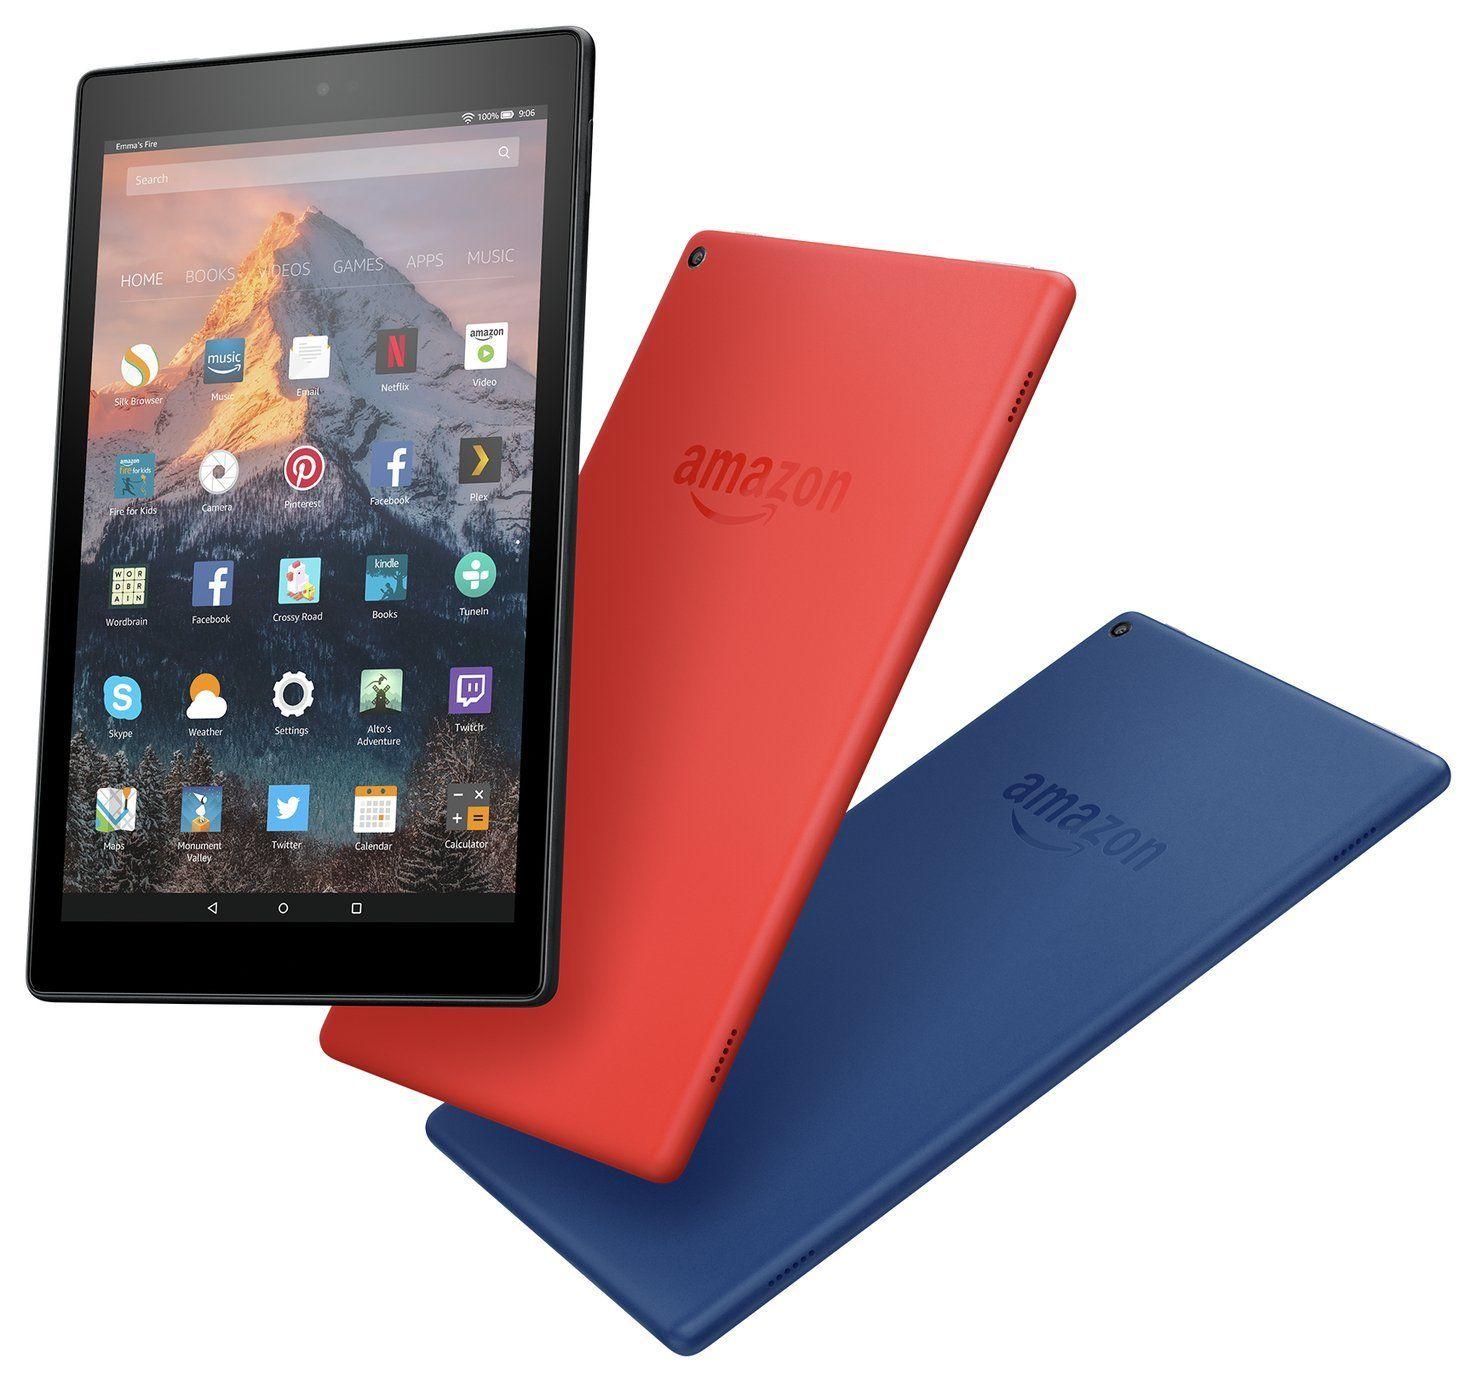 Amazon Fire HD 8 Alexa 8 Inch 16GB Tablet - (Black / Red / Blue) - £59.99 @ Argos (or Amazon Fire HD 10 10.1 Inch 32GB  £109.99)